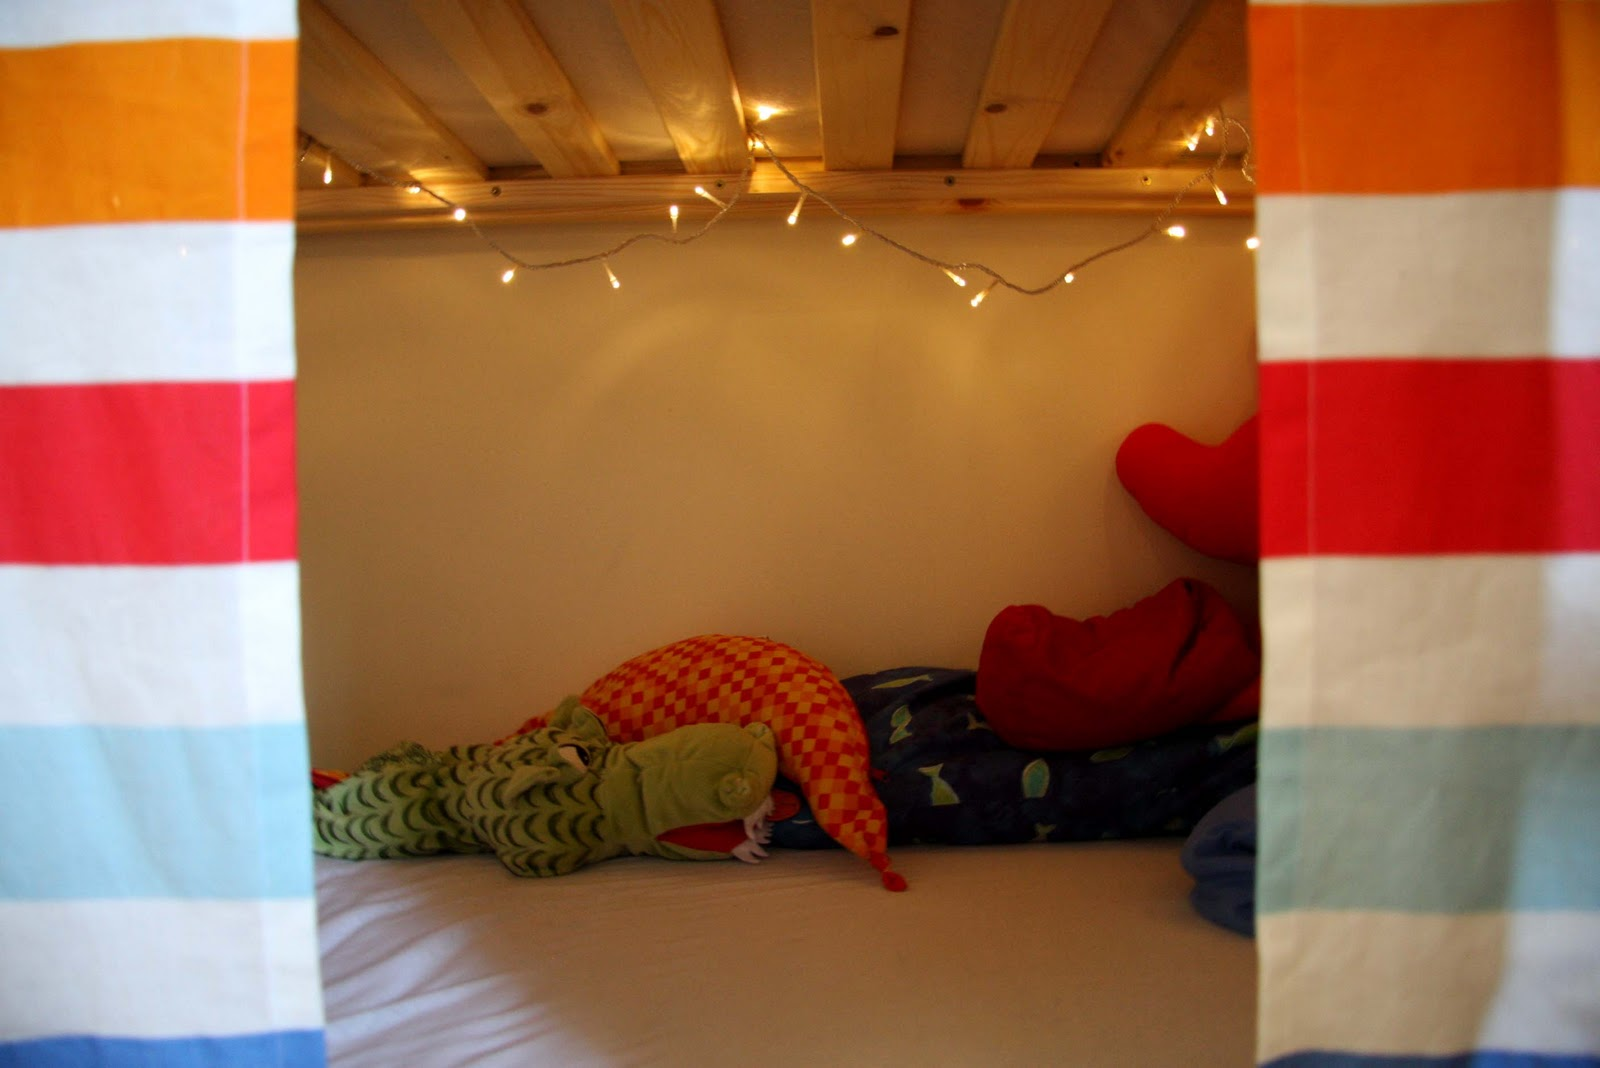 Ikea Etagenbett Vorhang : Vorhang für hochbett ikea u2013 home image ideen